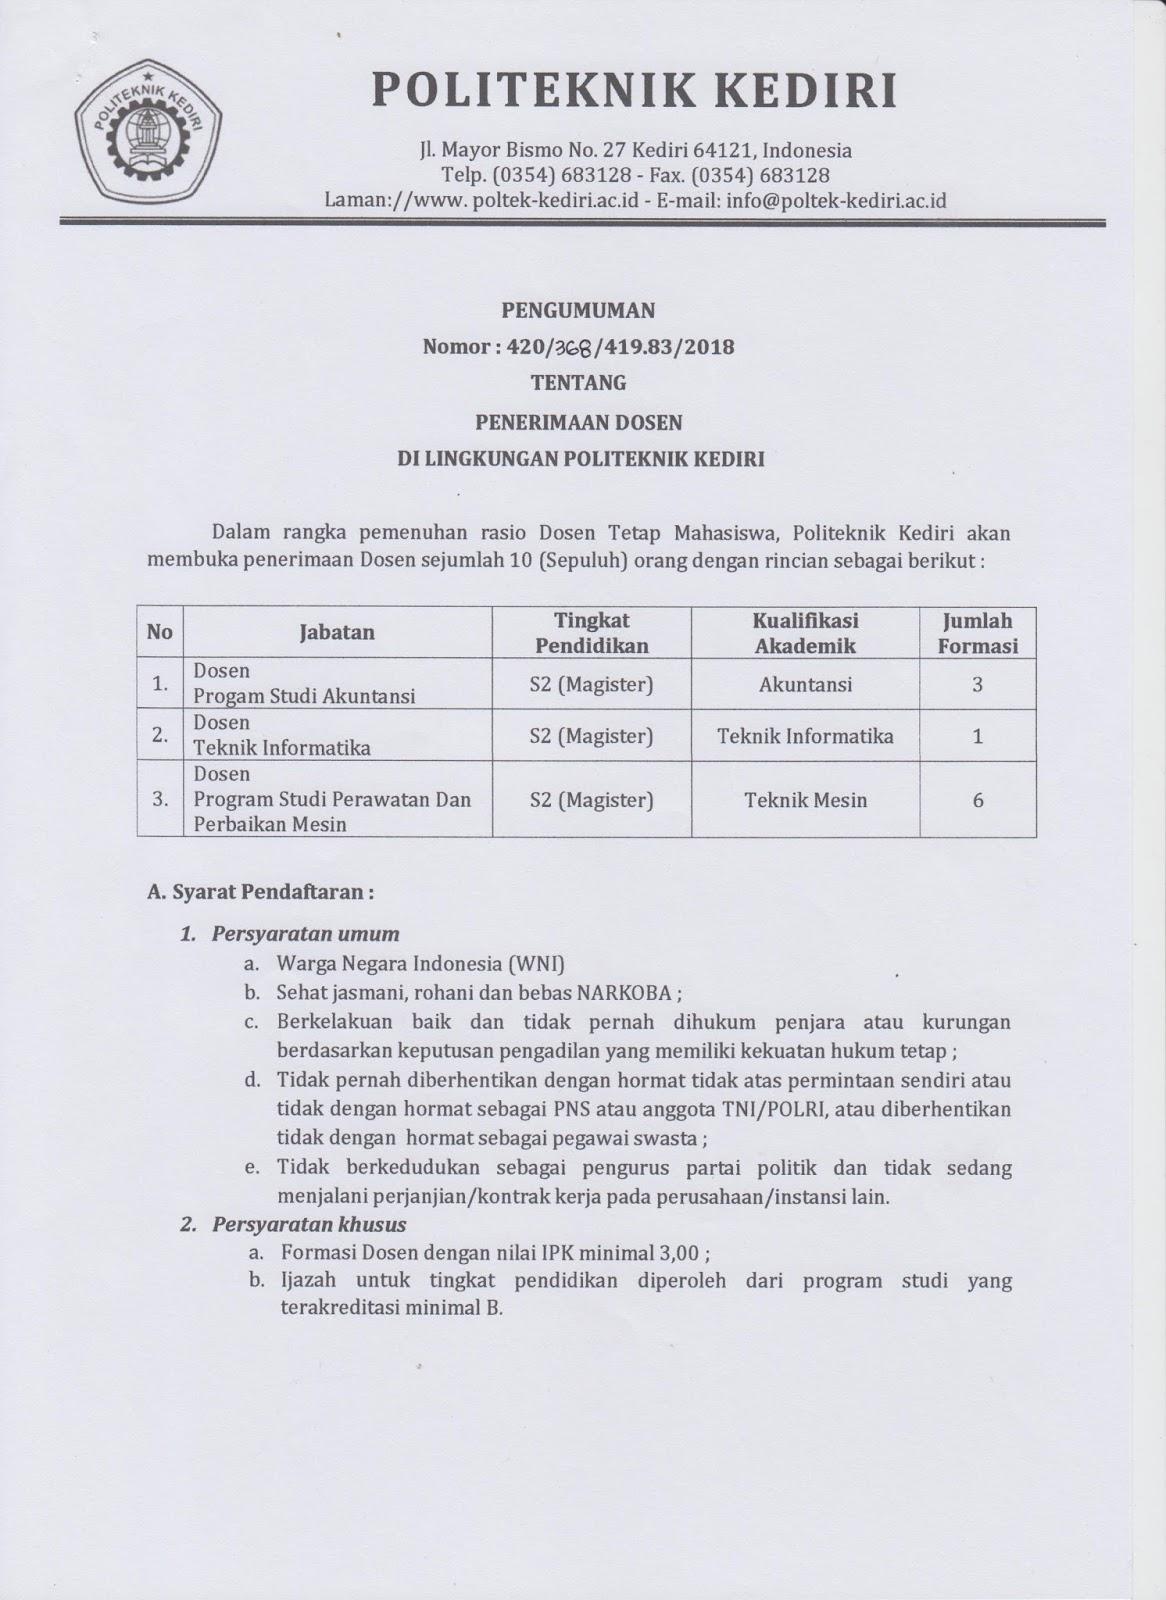 lowongan Dosen Akuntansi & Teknik Informatika Politeknik Kediri